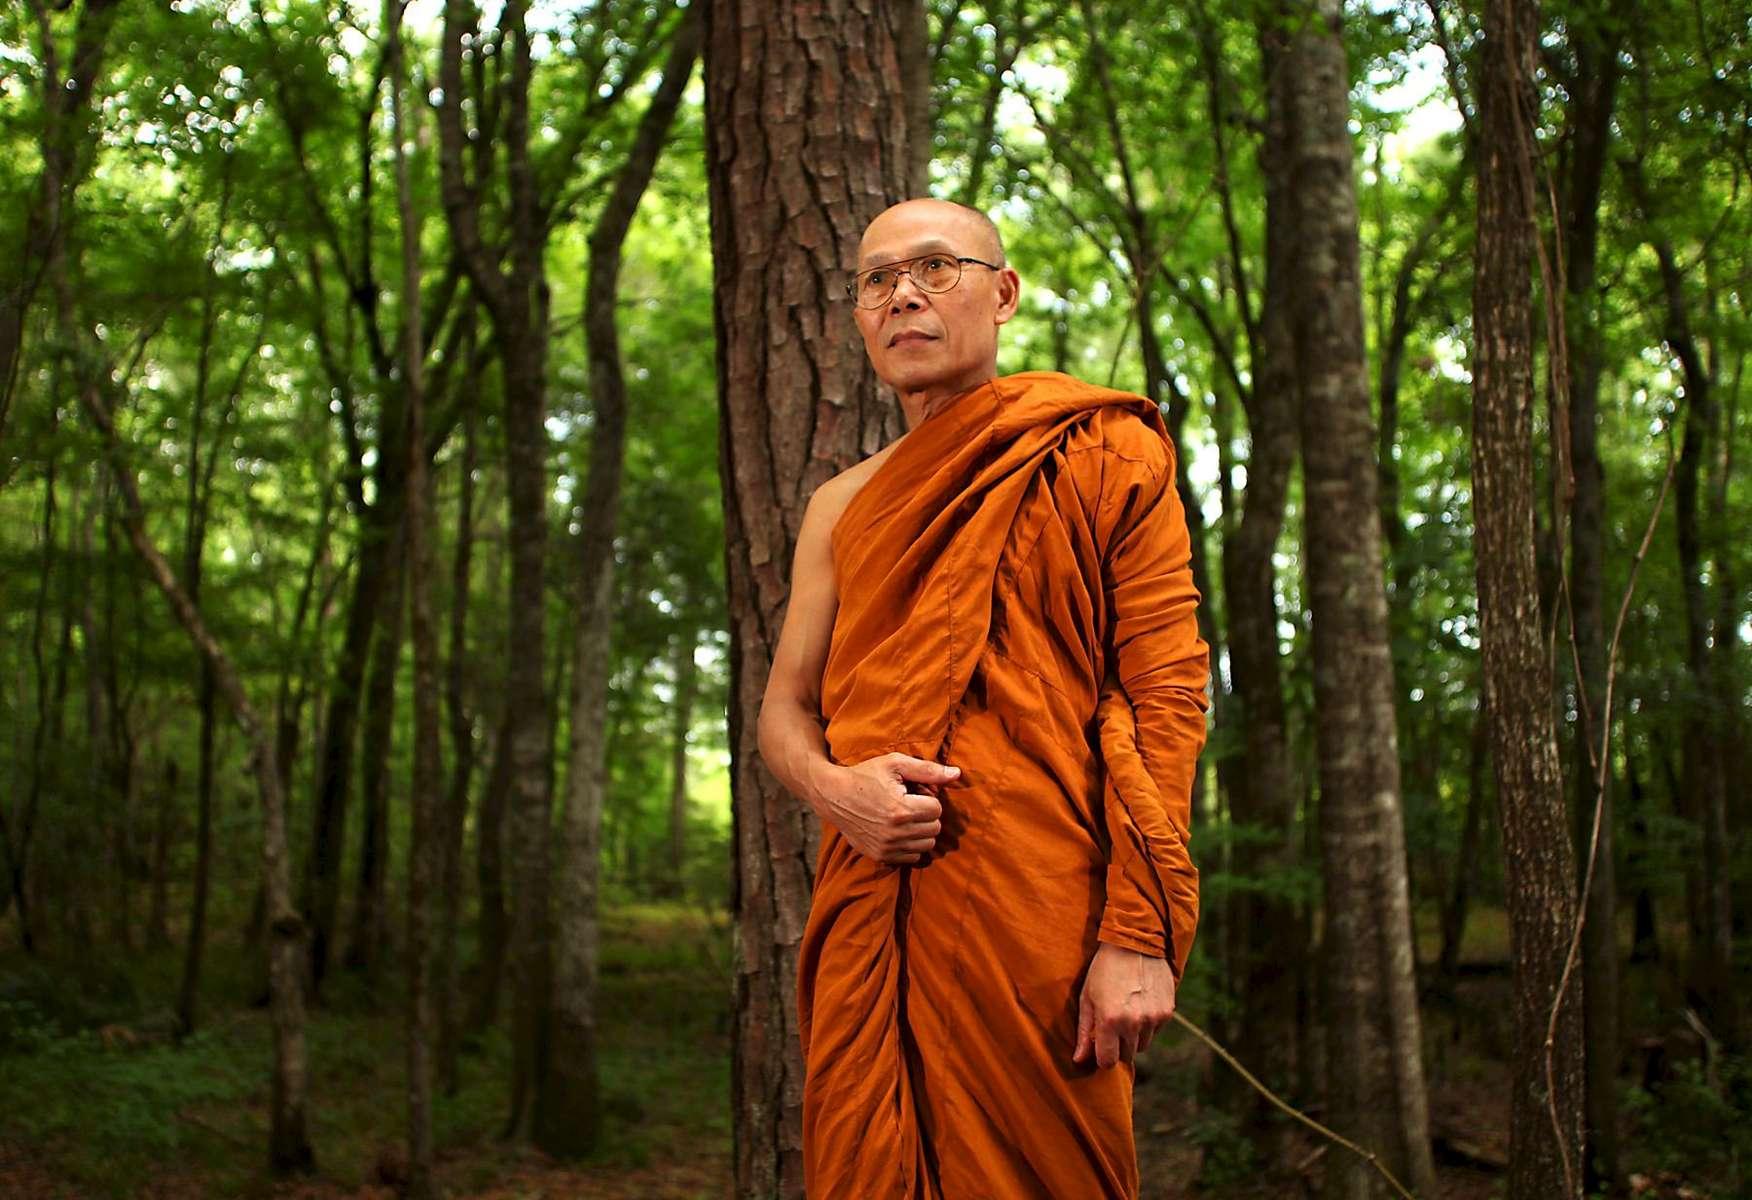 Phra Thiep, a resident monk at Wat Carolina in Bolivia, N.C.